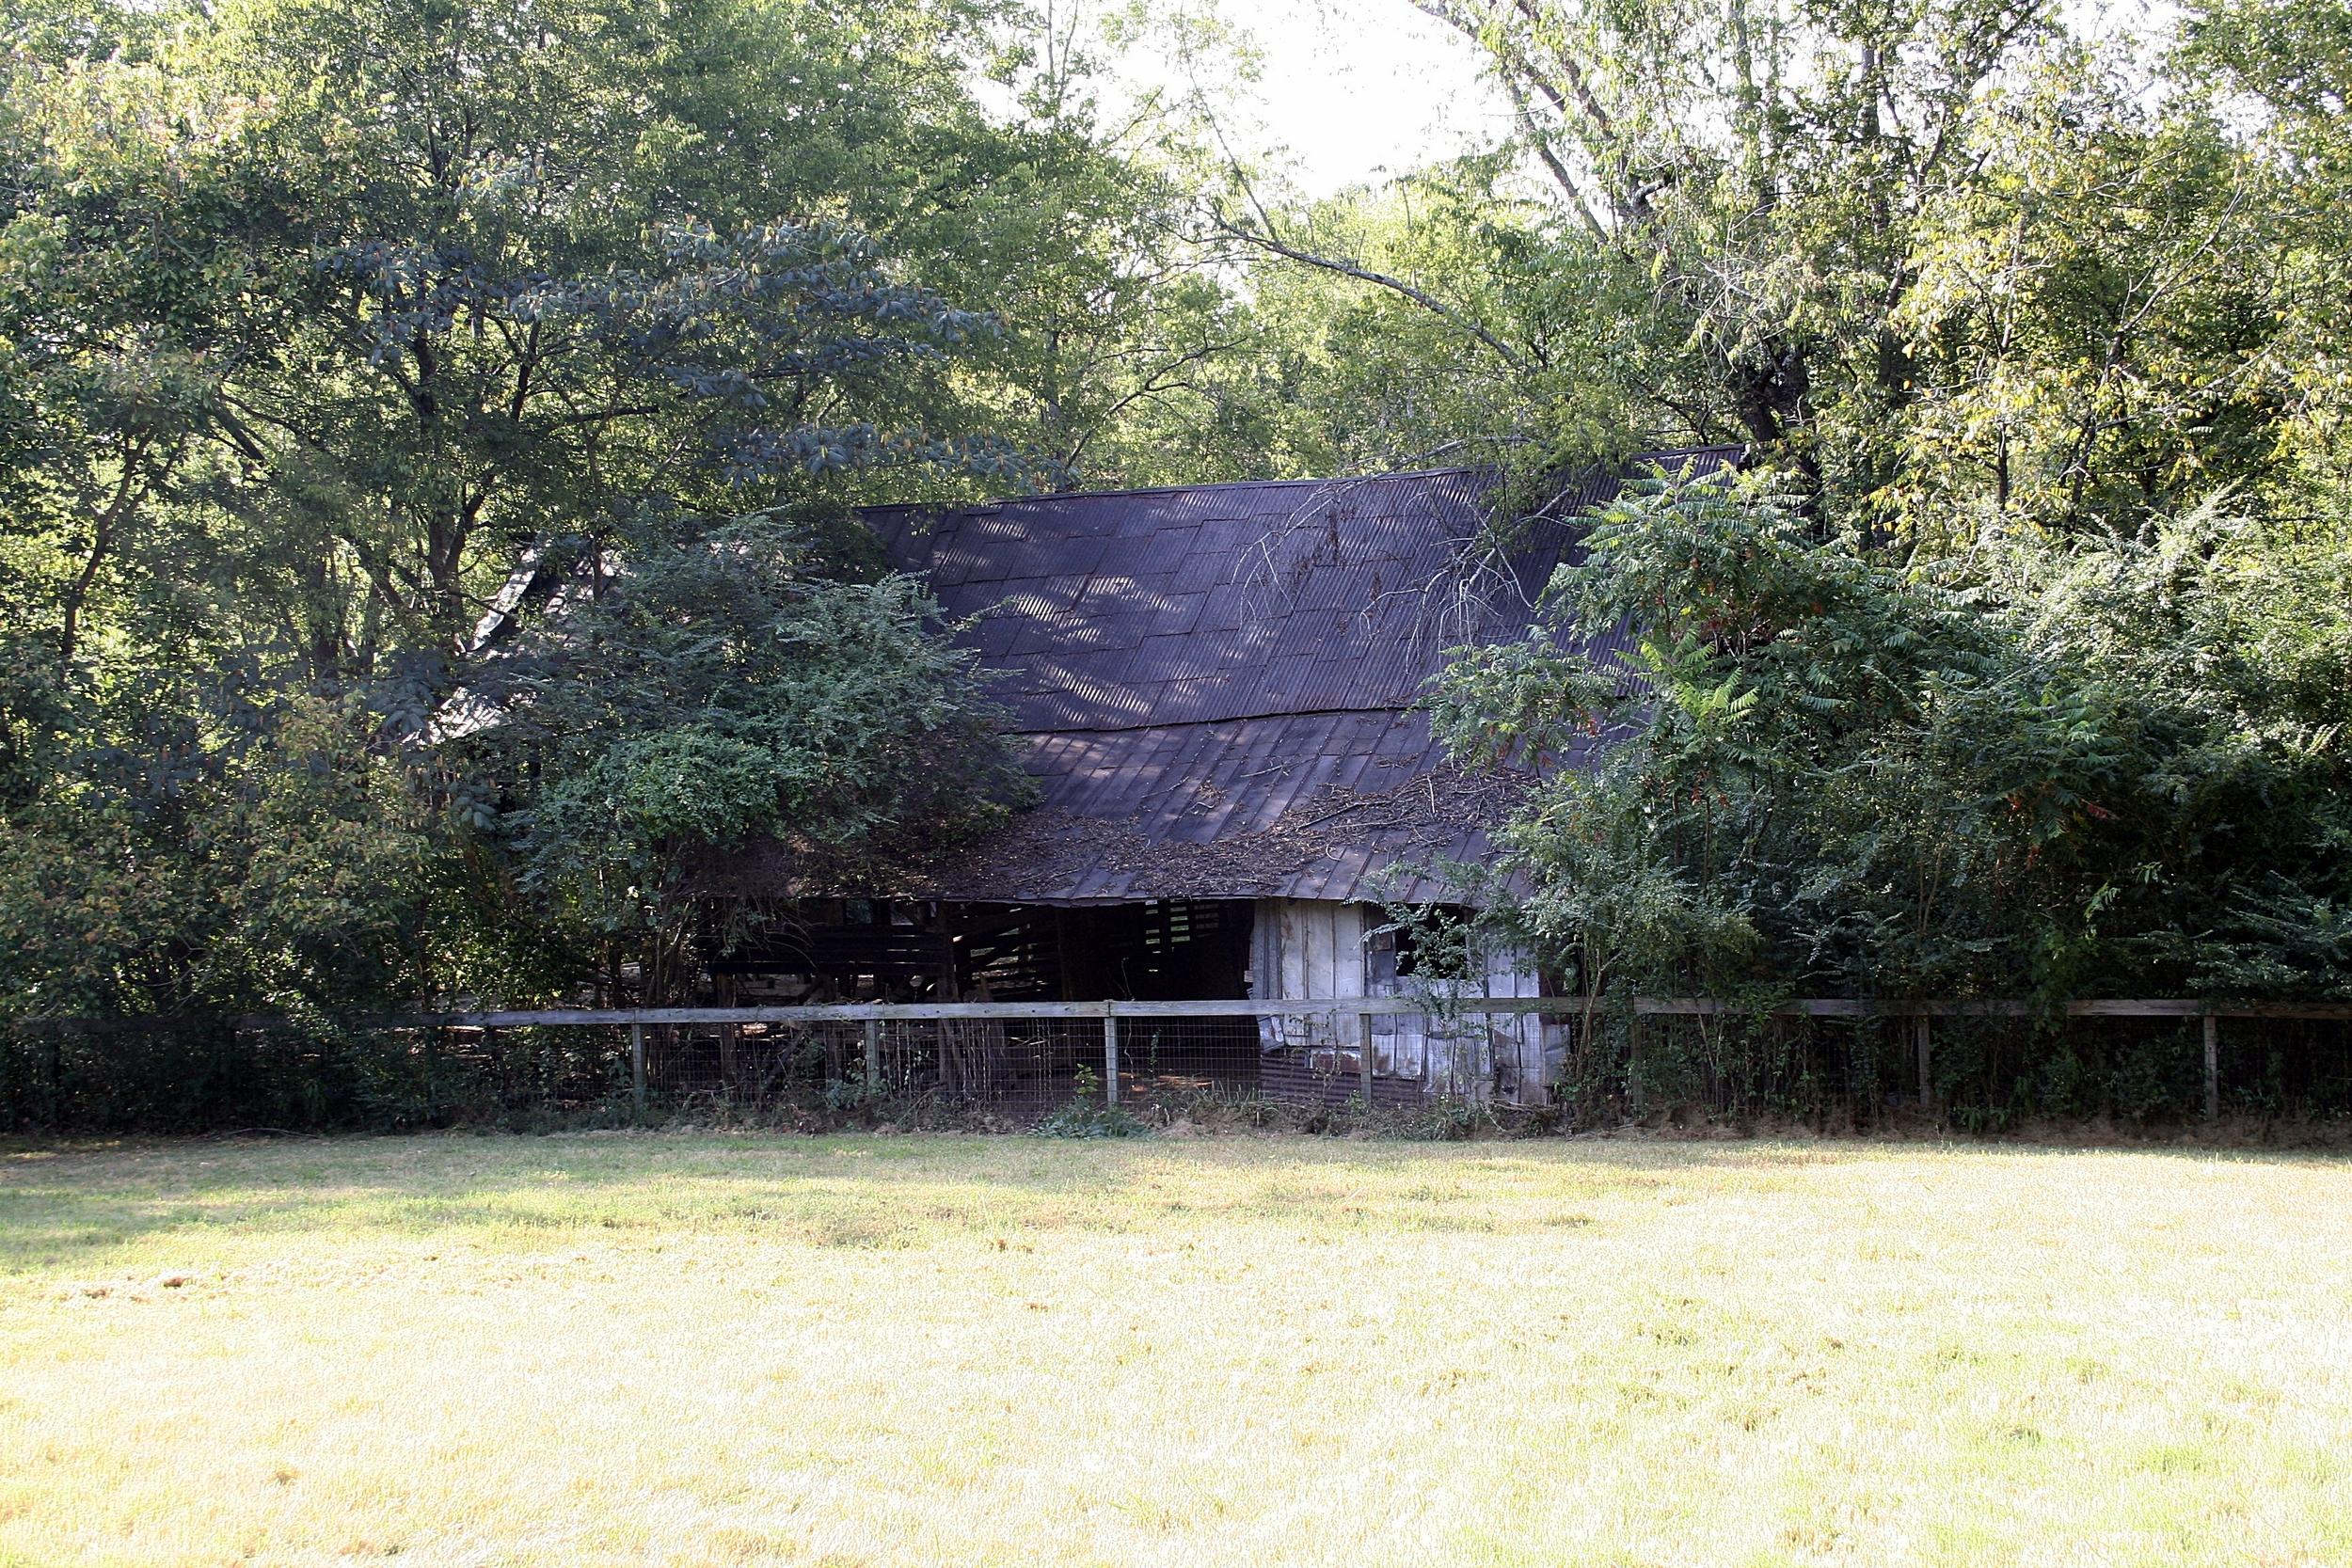 The Turner Barn